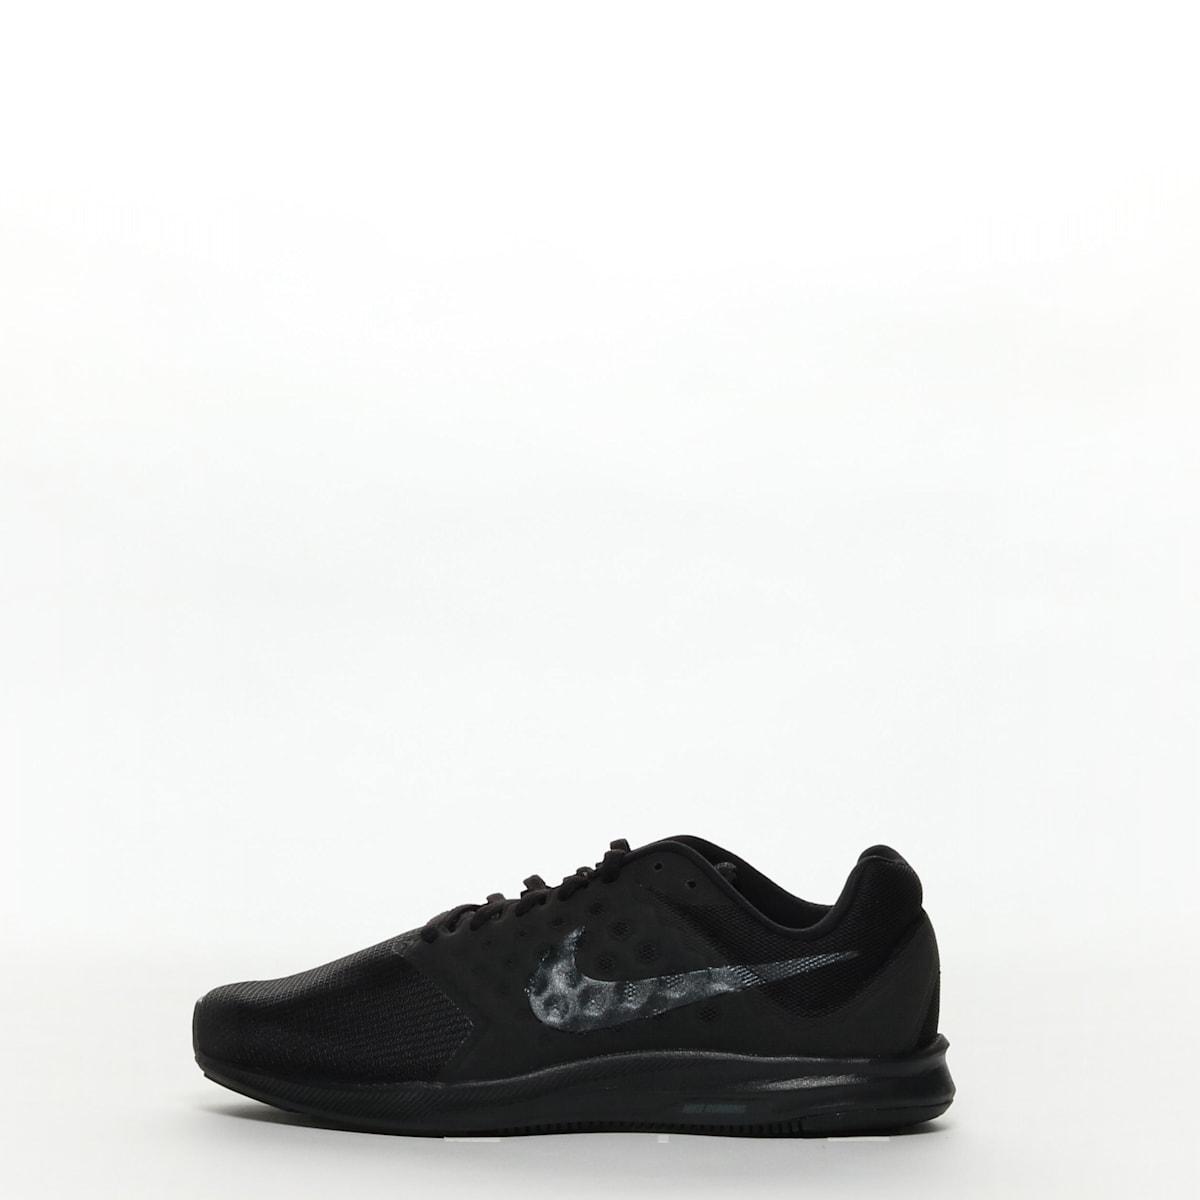 7524e9844d875 Men s Nike Downshifter 7 Running Shoe (4E) - BLACK MTLCHT – Resku